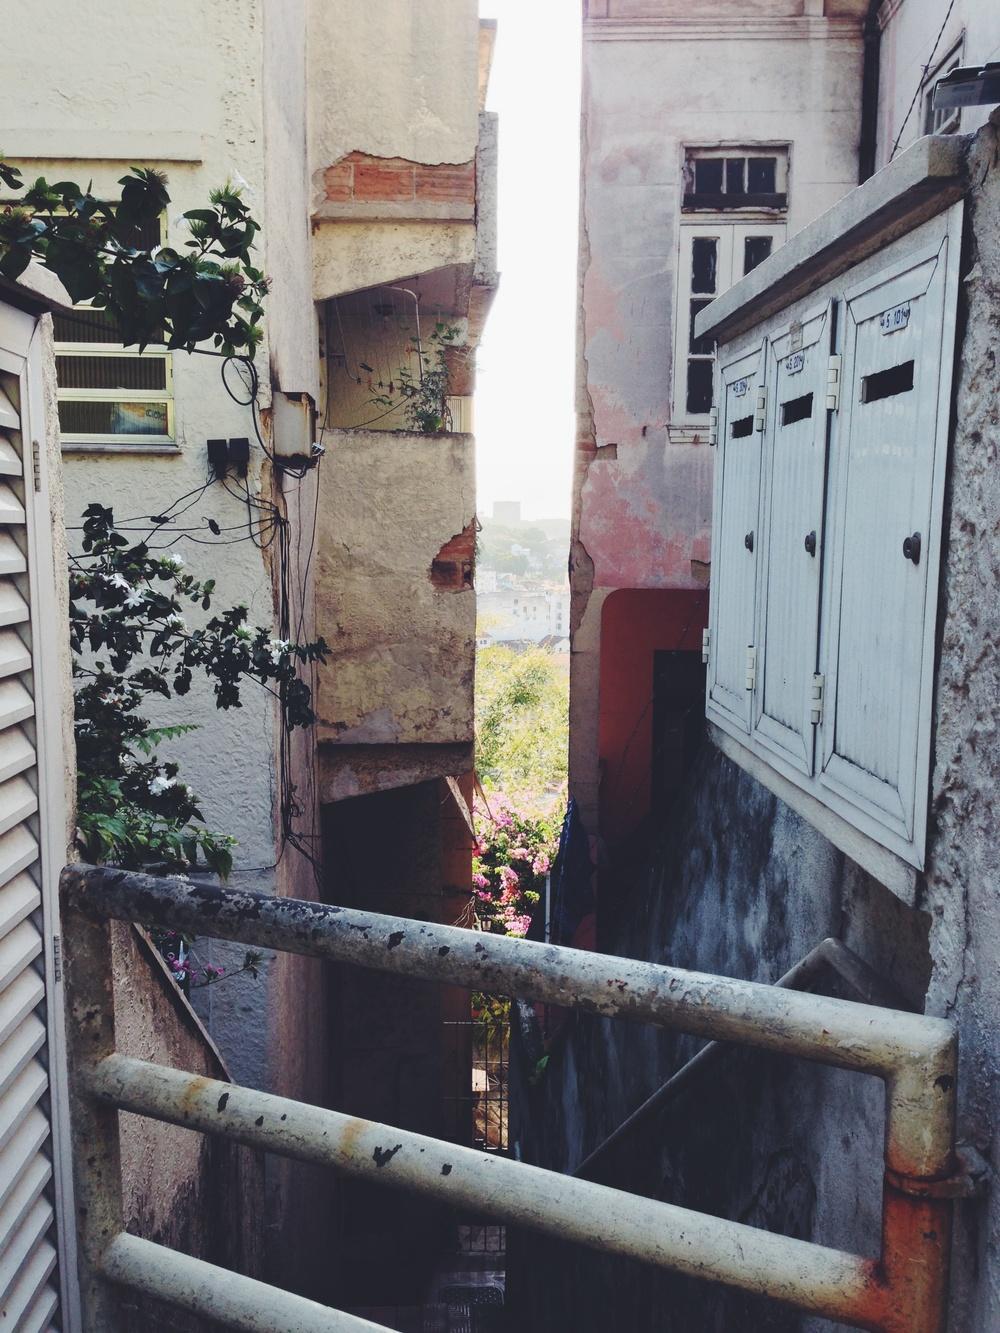 Brazil, Rio de Janeiro, Landscape, Travel photography, architecture, Santa Teresa, street photography